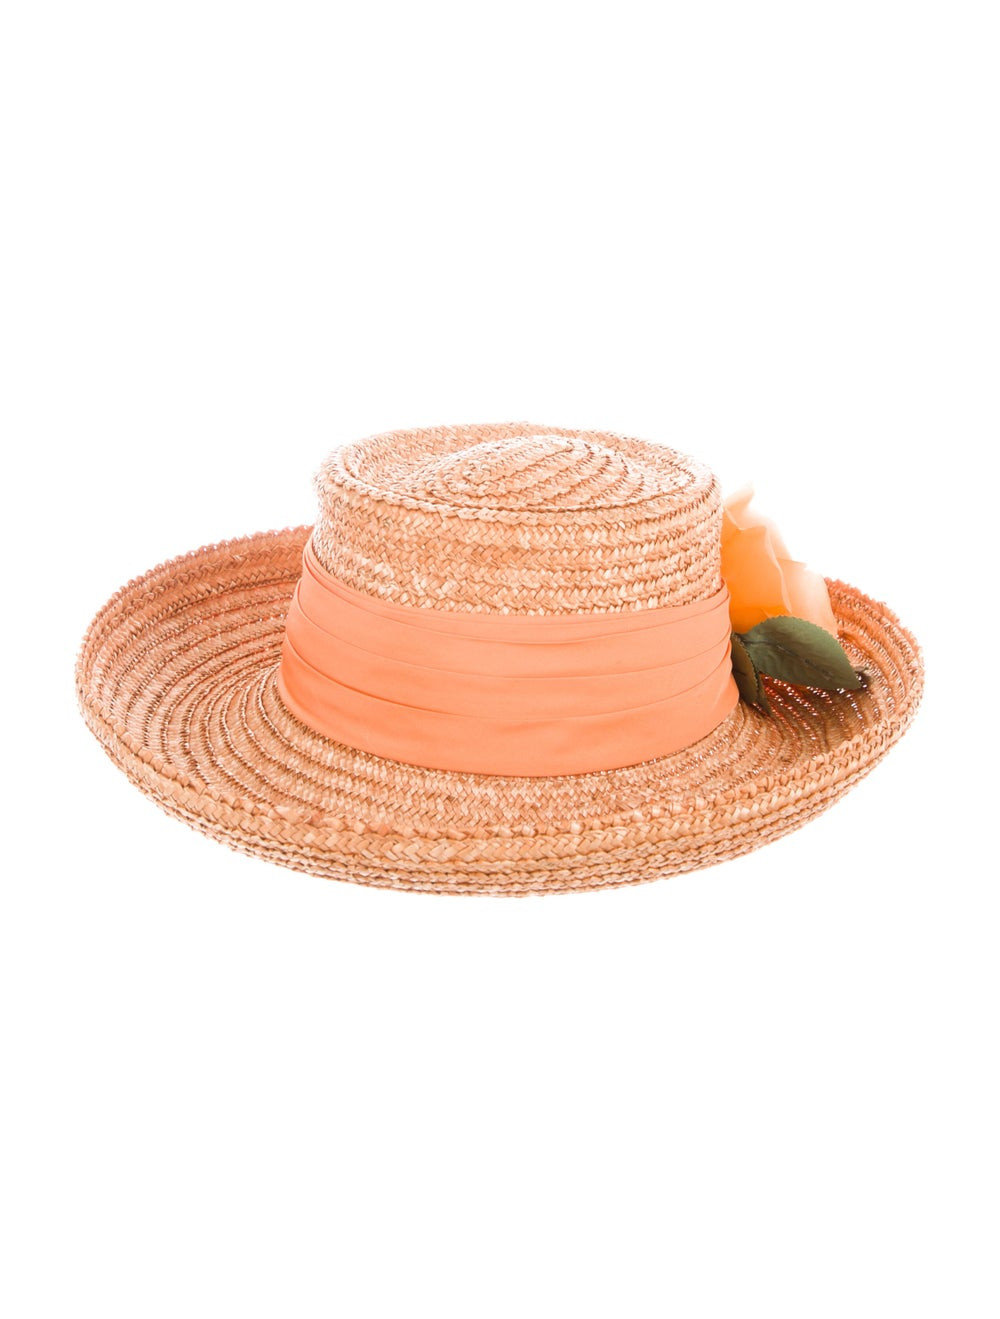 Eric Javits Straw Wide Brim Hat - image 1